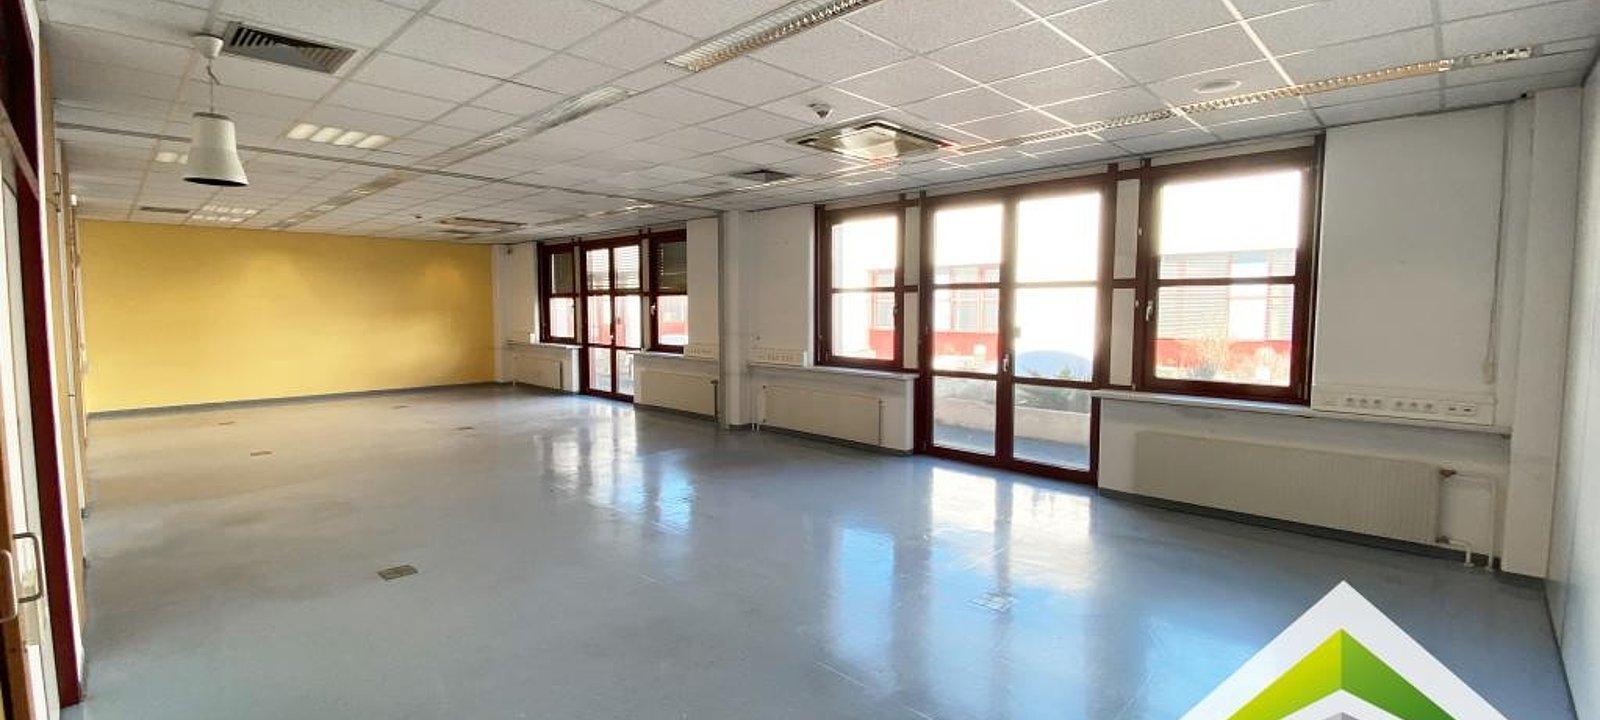 Teilbarer Seminarraum